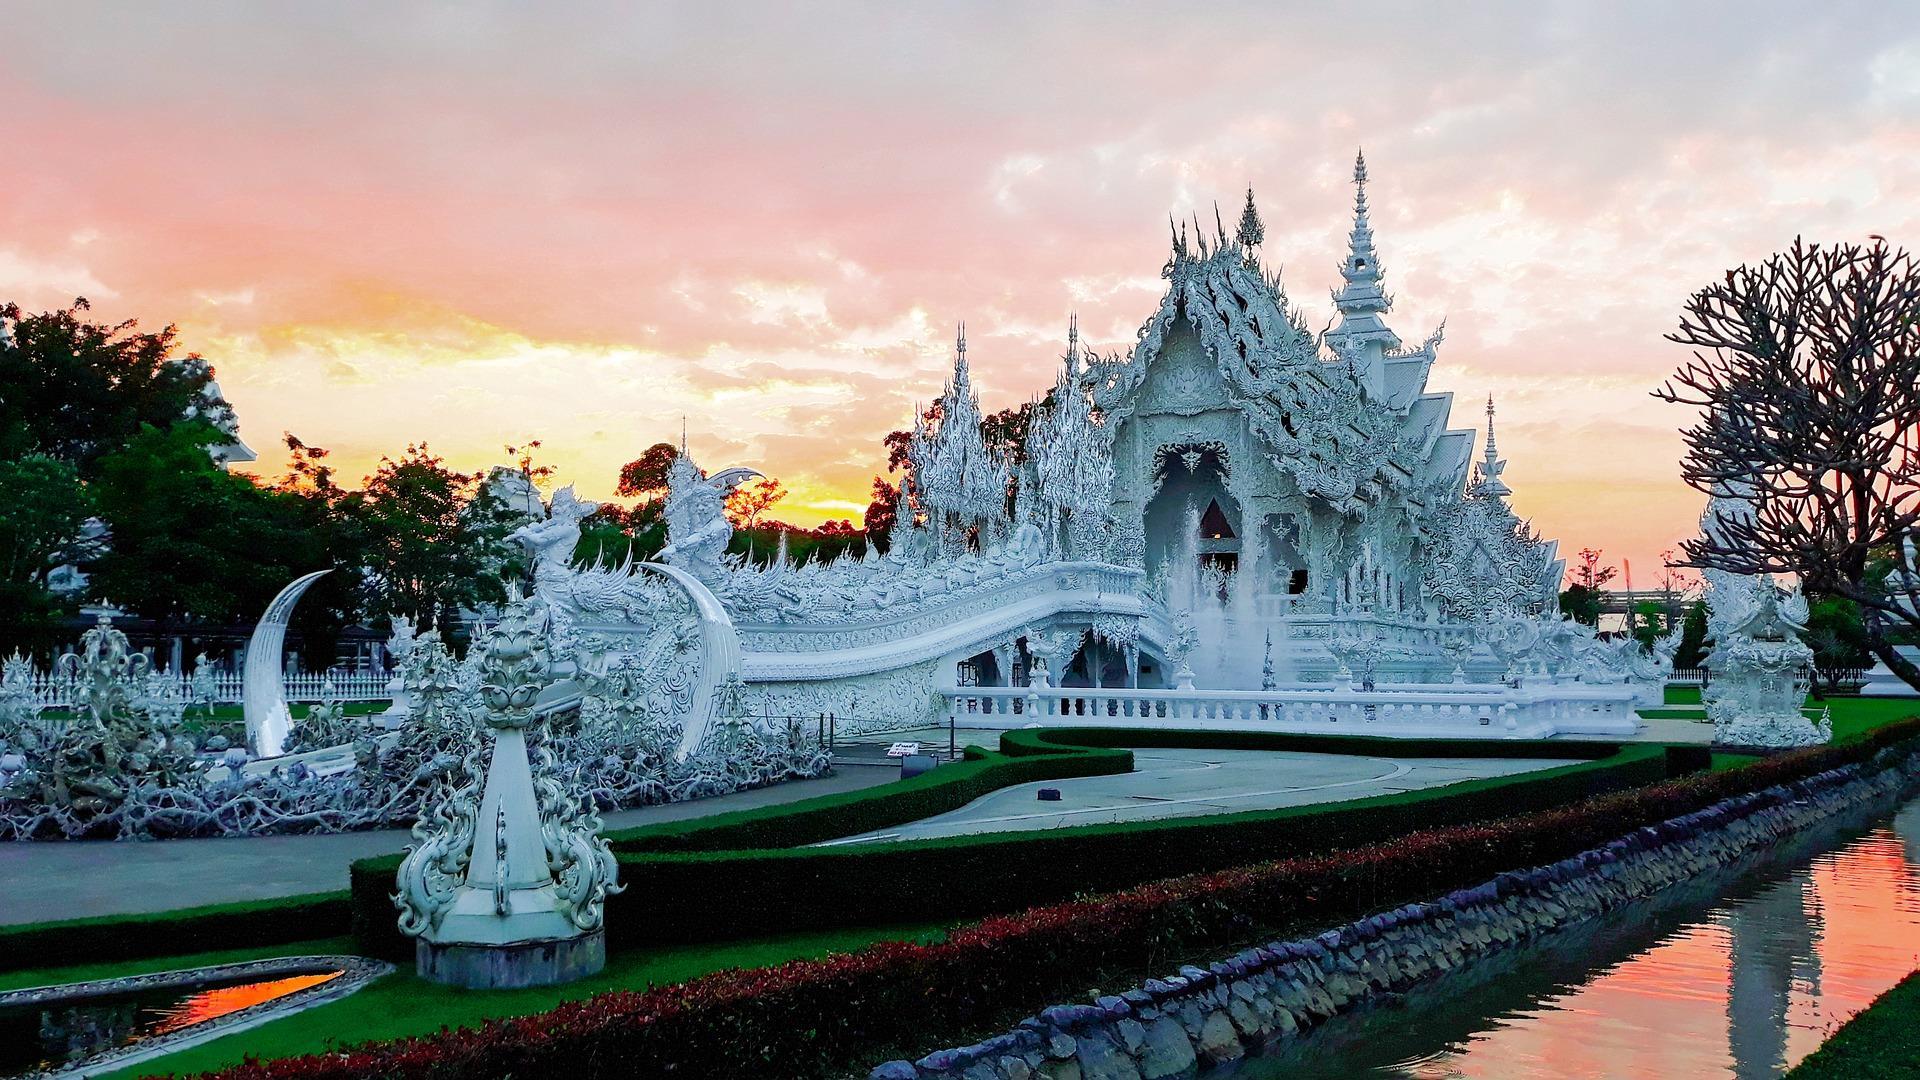 /optitravel/online/www/layout22/single_product.php?pkt_id=250&Produto=Tailândia Clássica & Phuket&destino=TAILÂNDIA